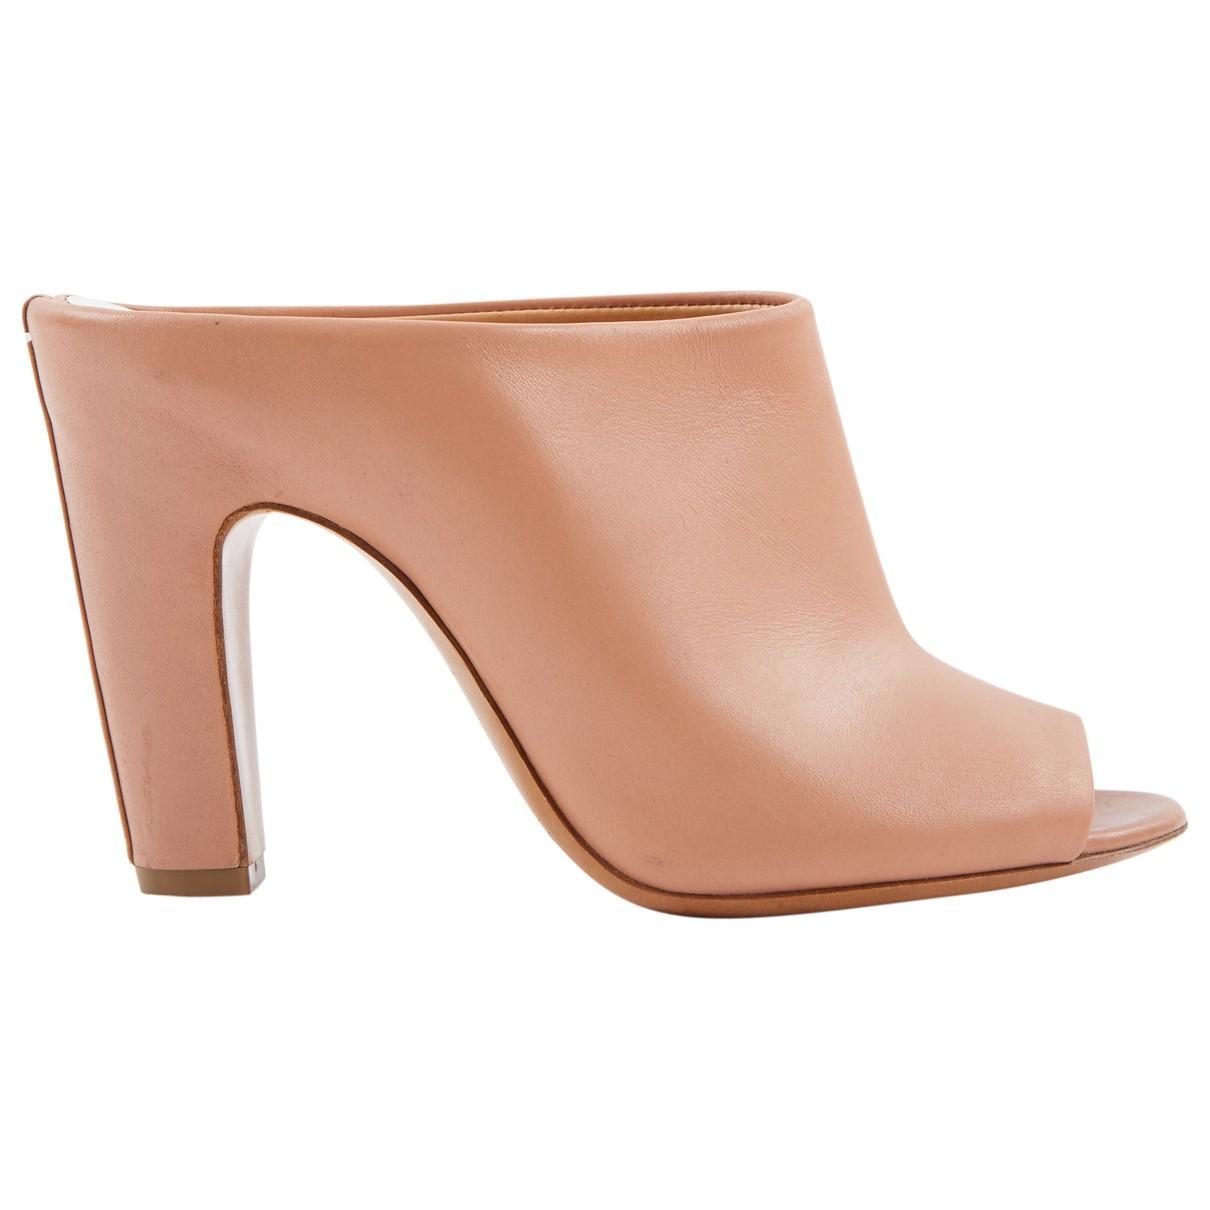 super cute 30c99 35378 maison-martin-margiela-Pink-Leather-Mules.jpeg